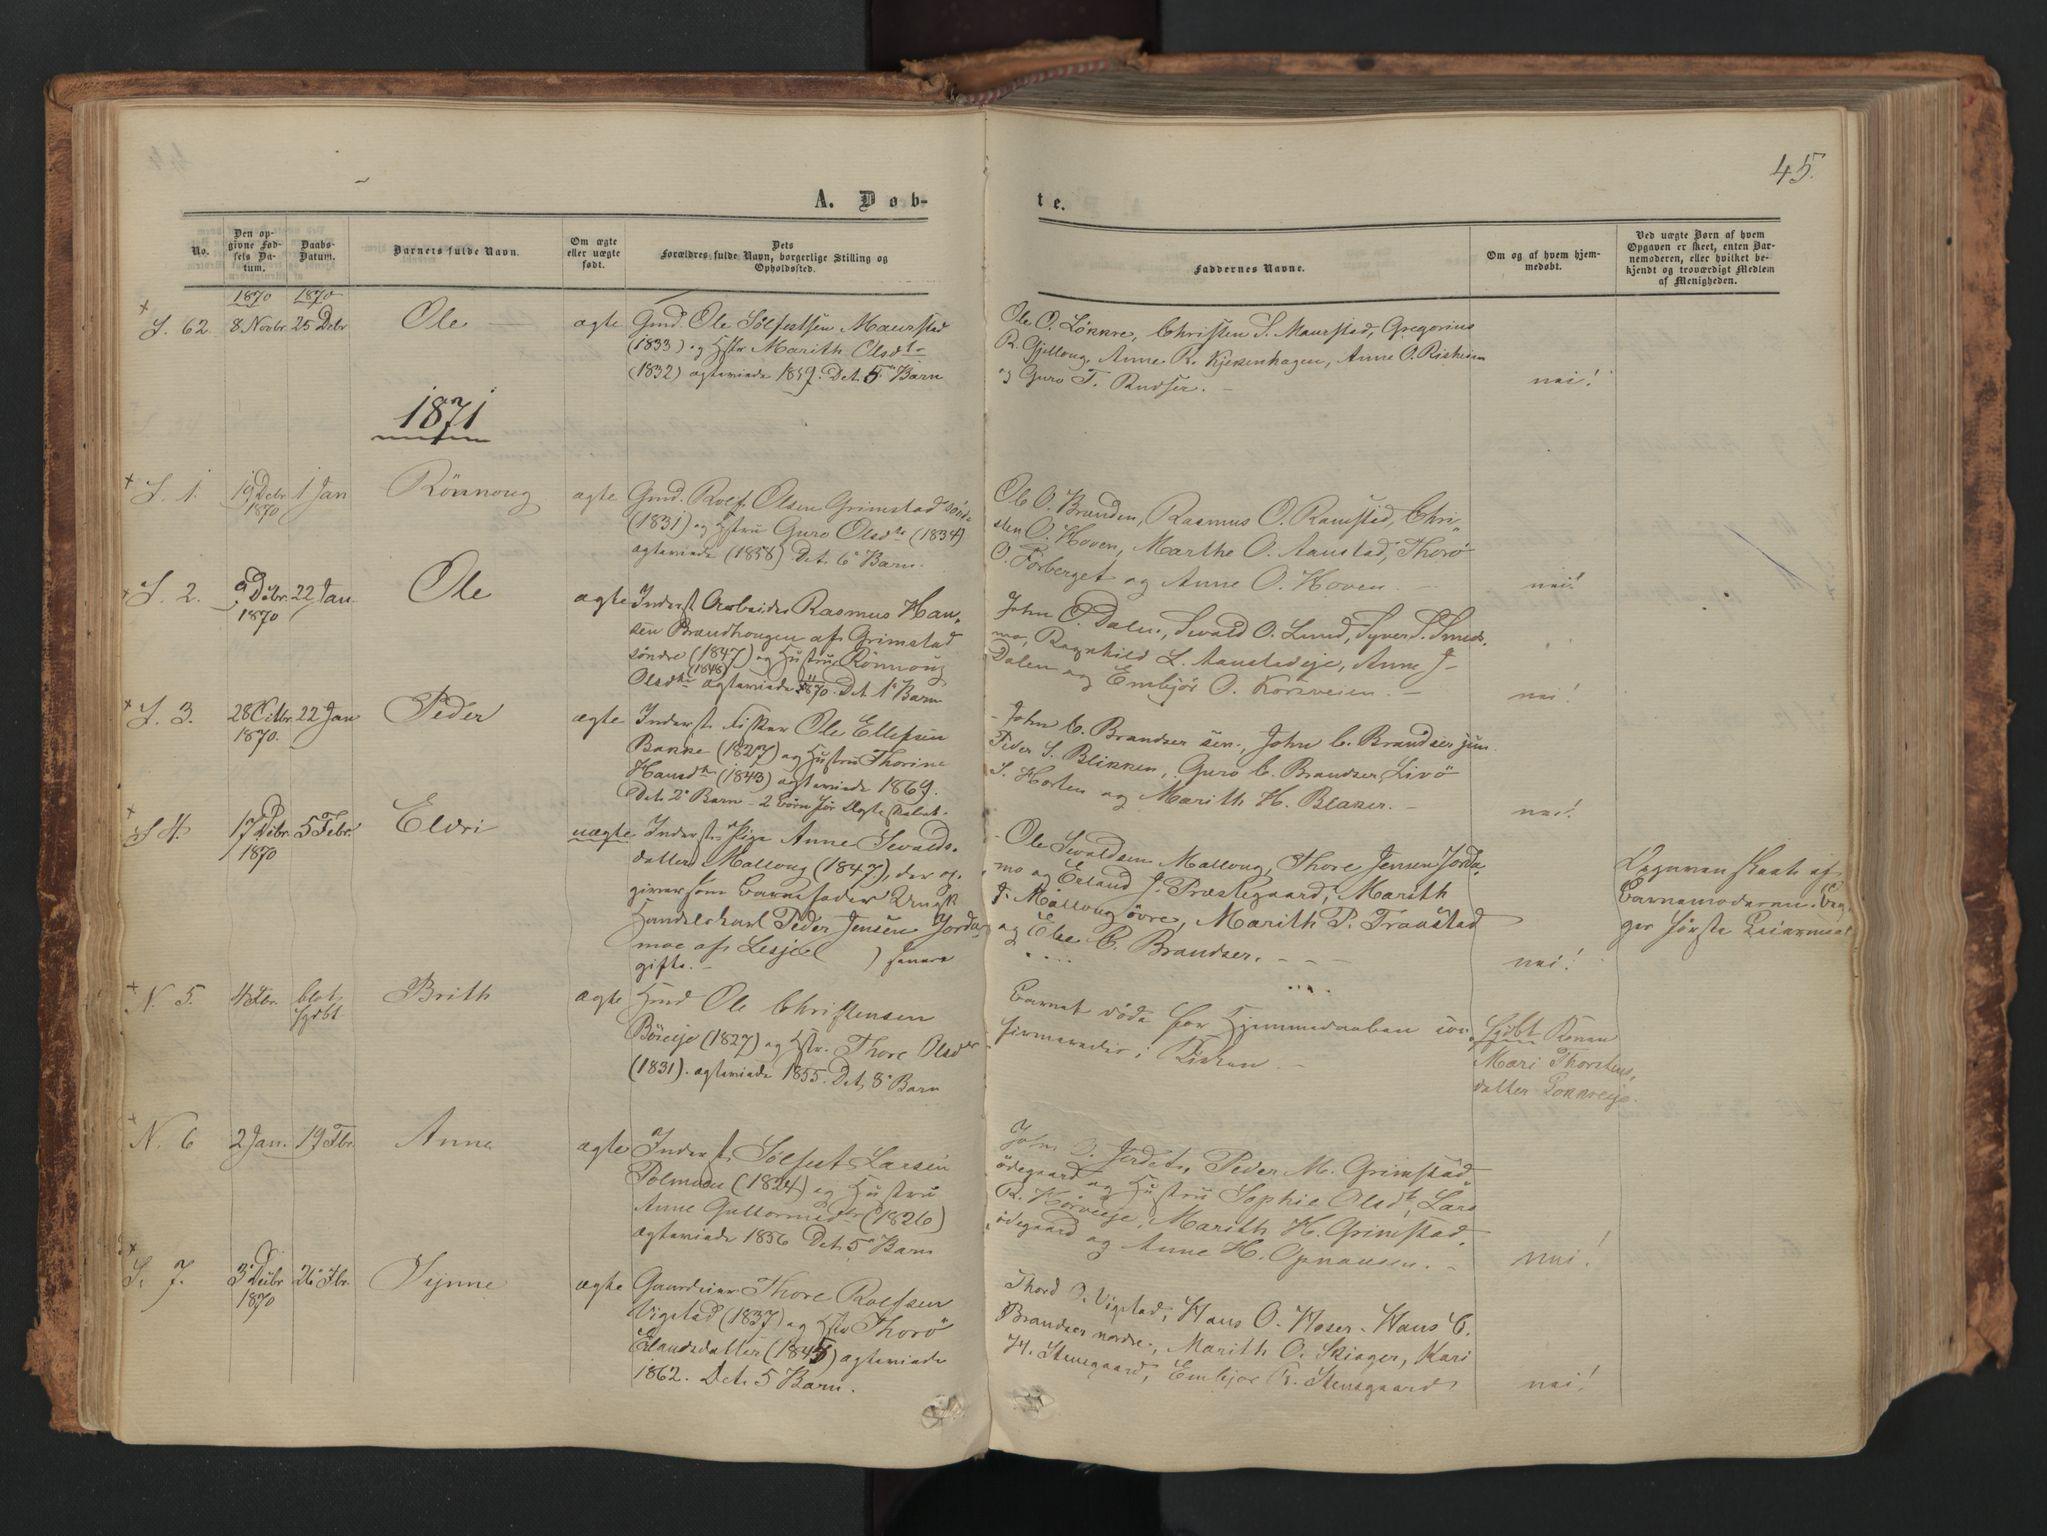 SAH, Skjåk prestekontor, Ministerialbok nr. 1, 1863-1879, s. 45